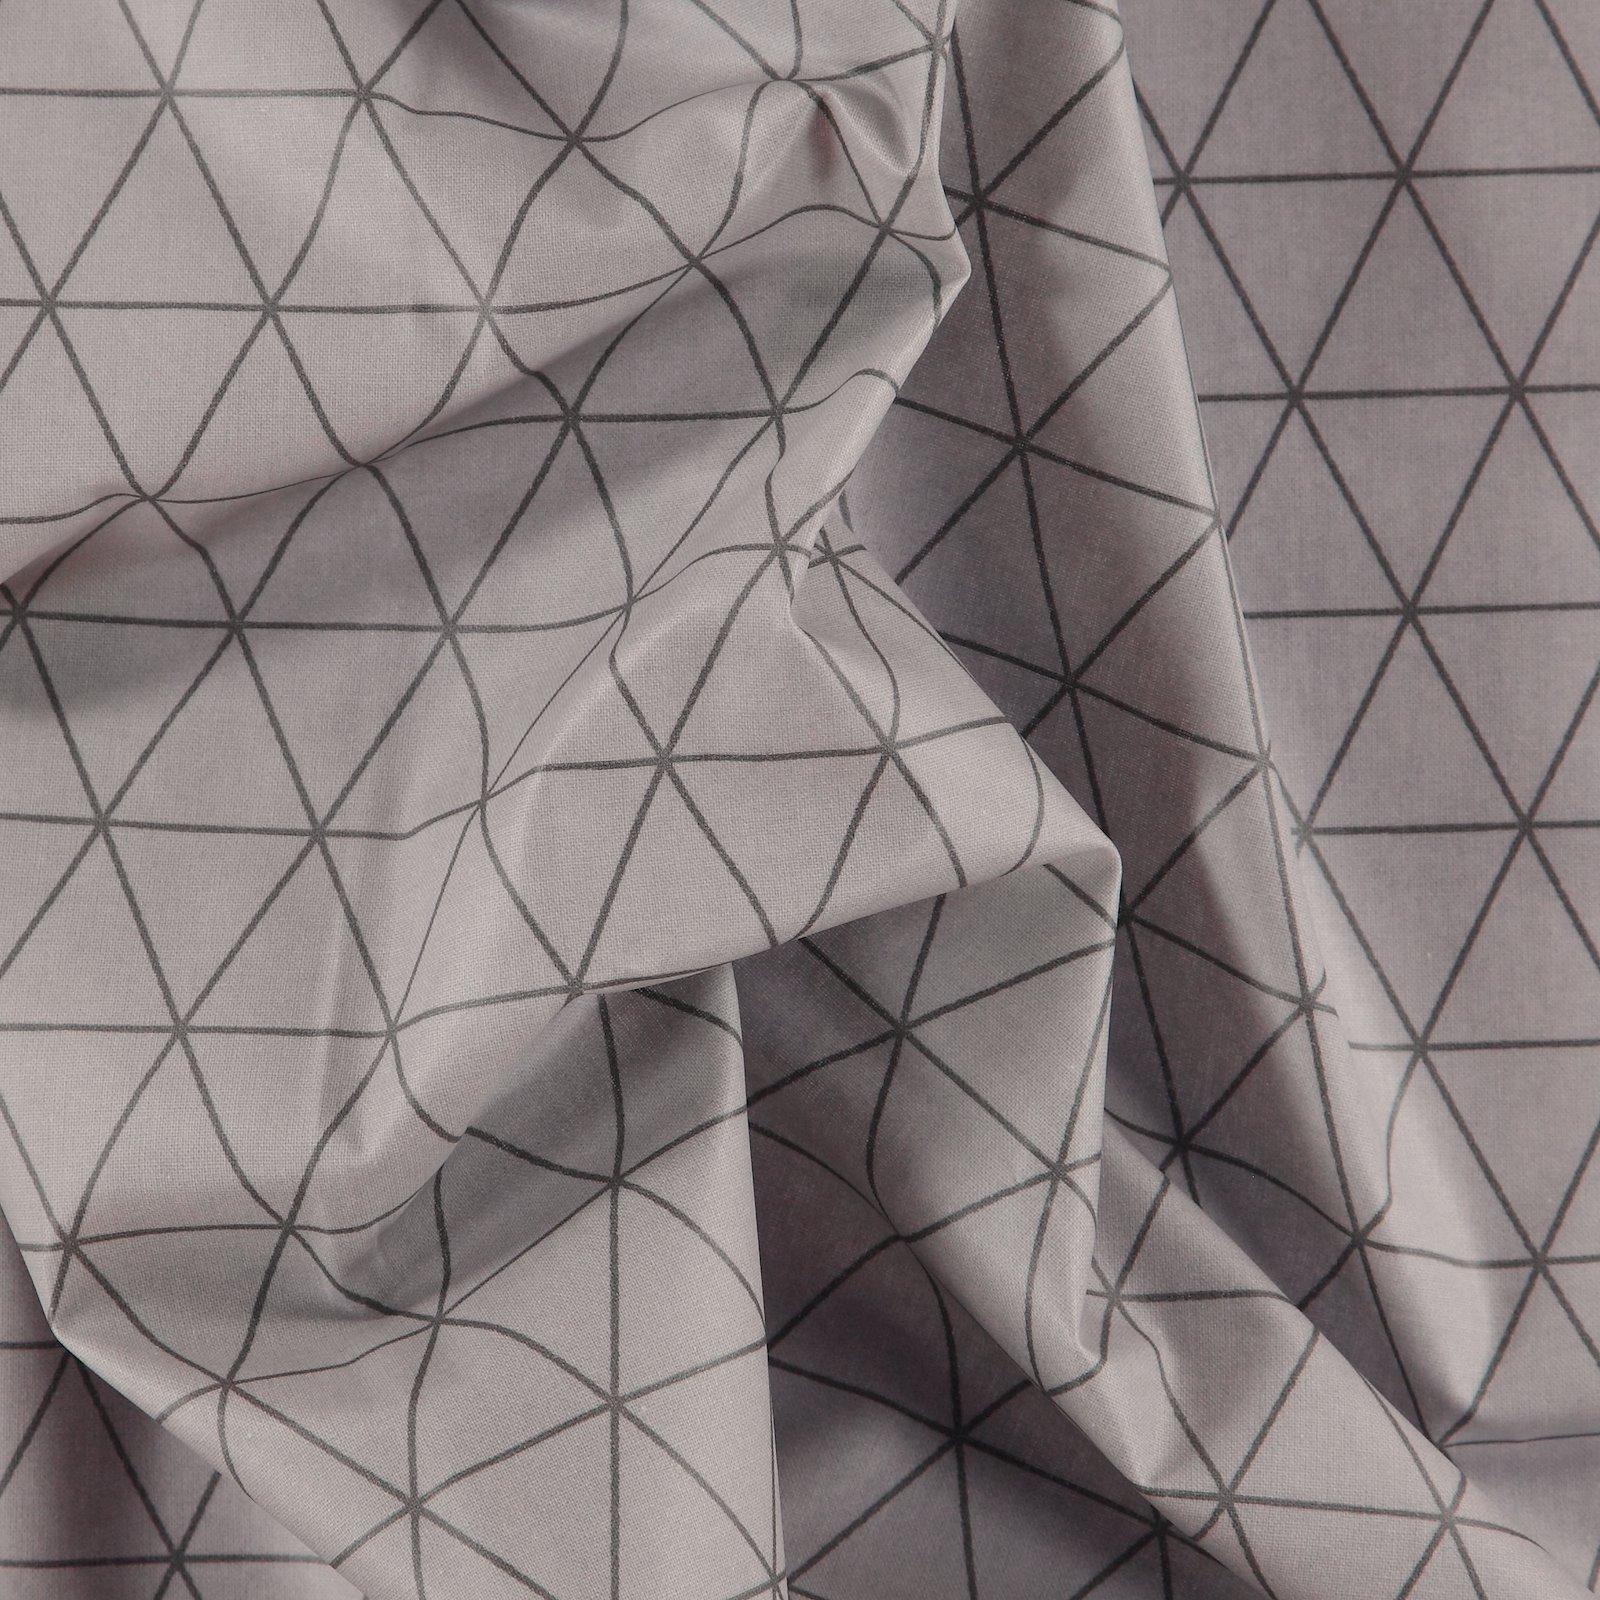 Woven oil cloth grey w dark grey graphic